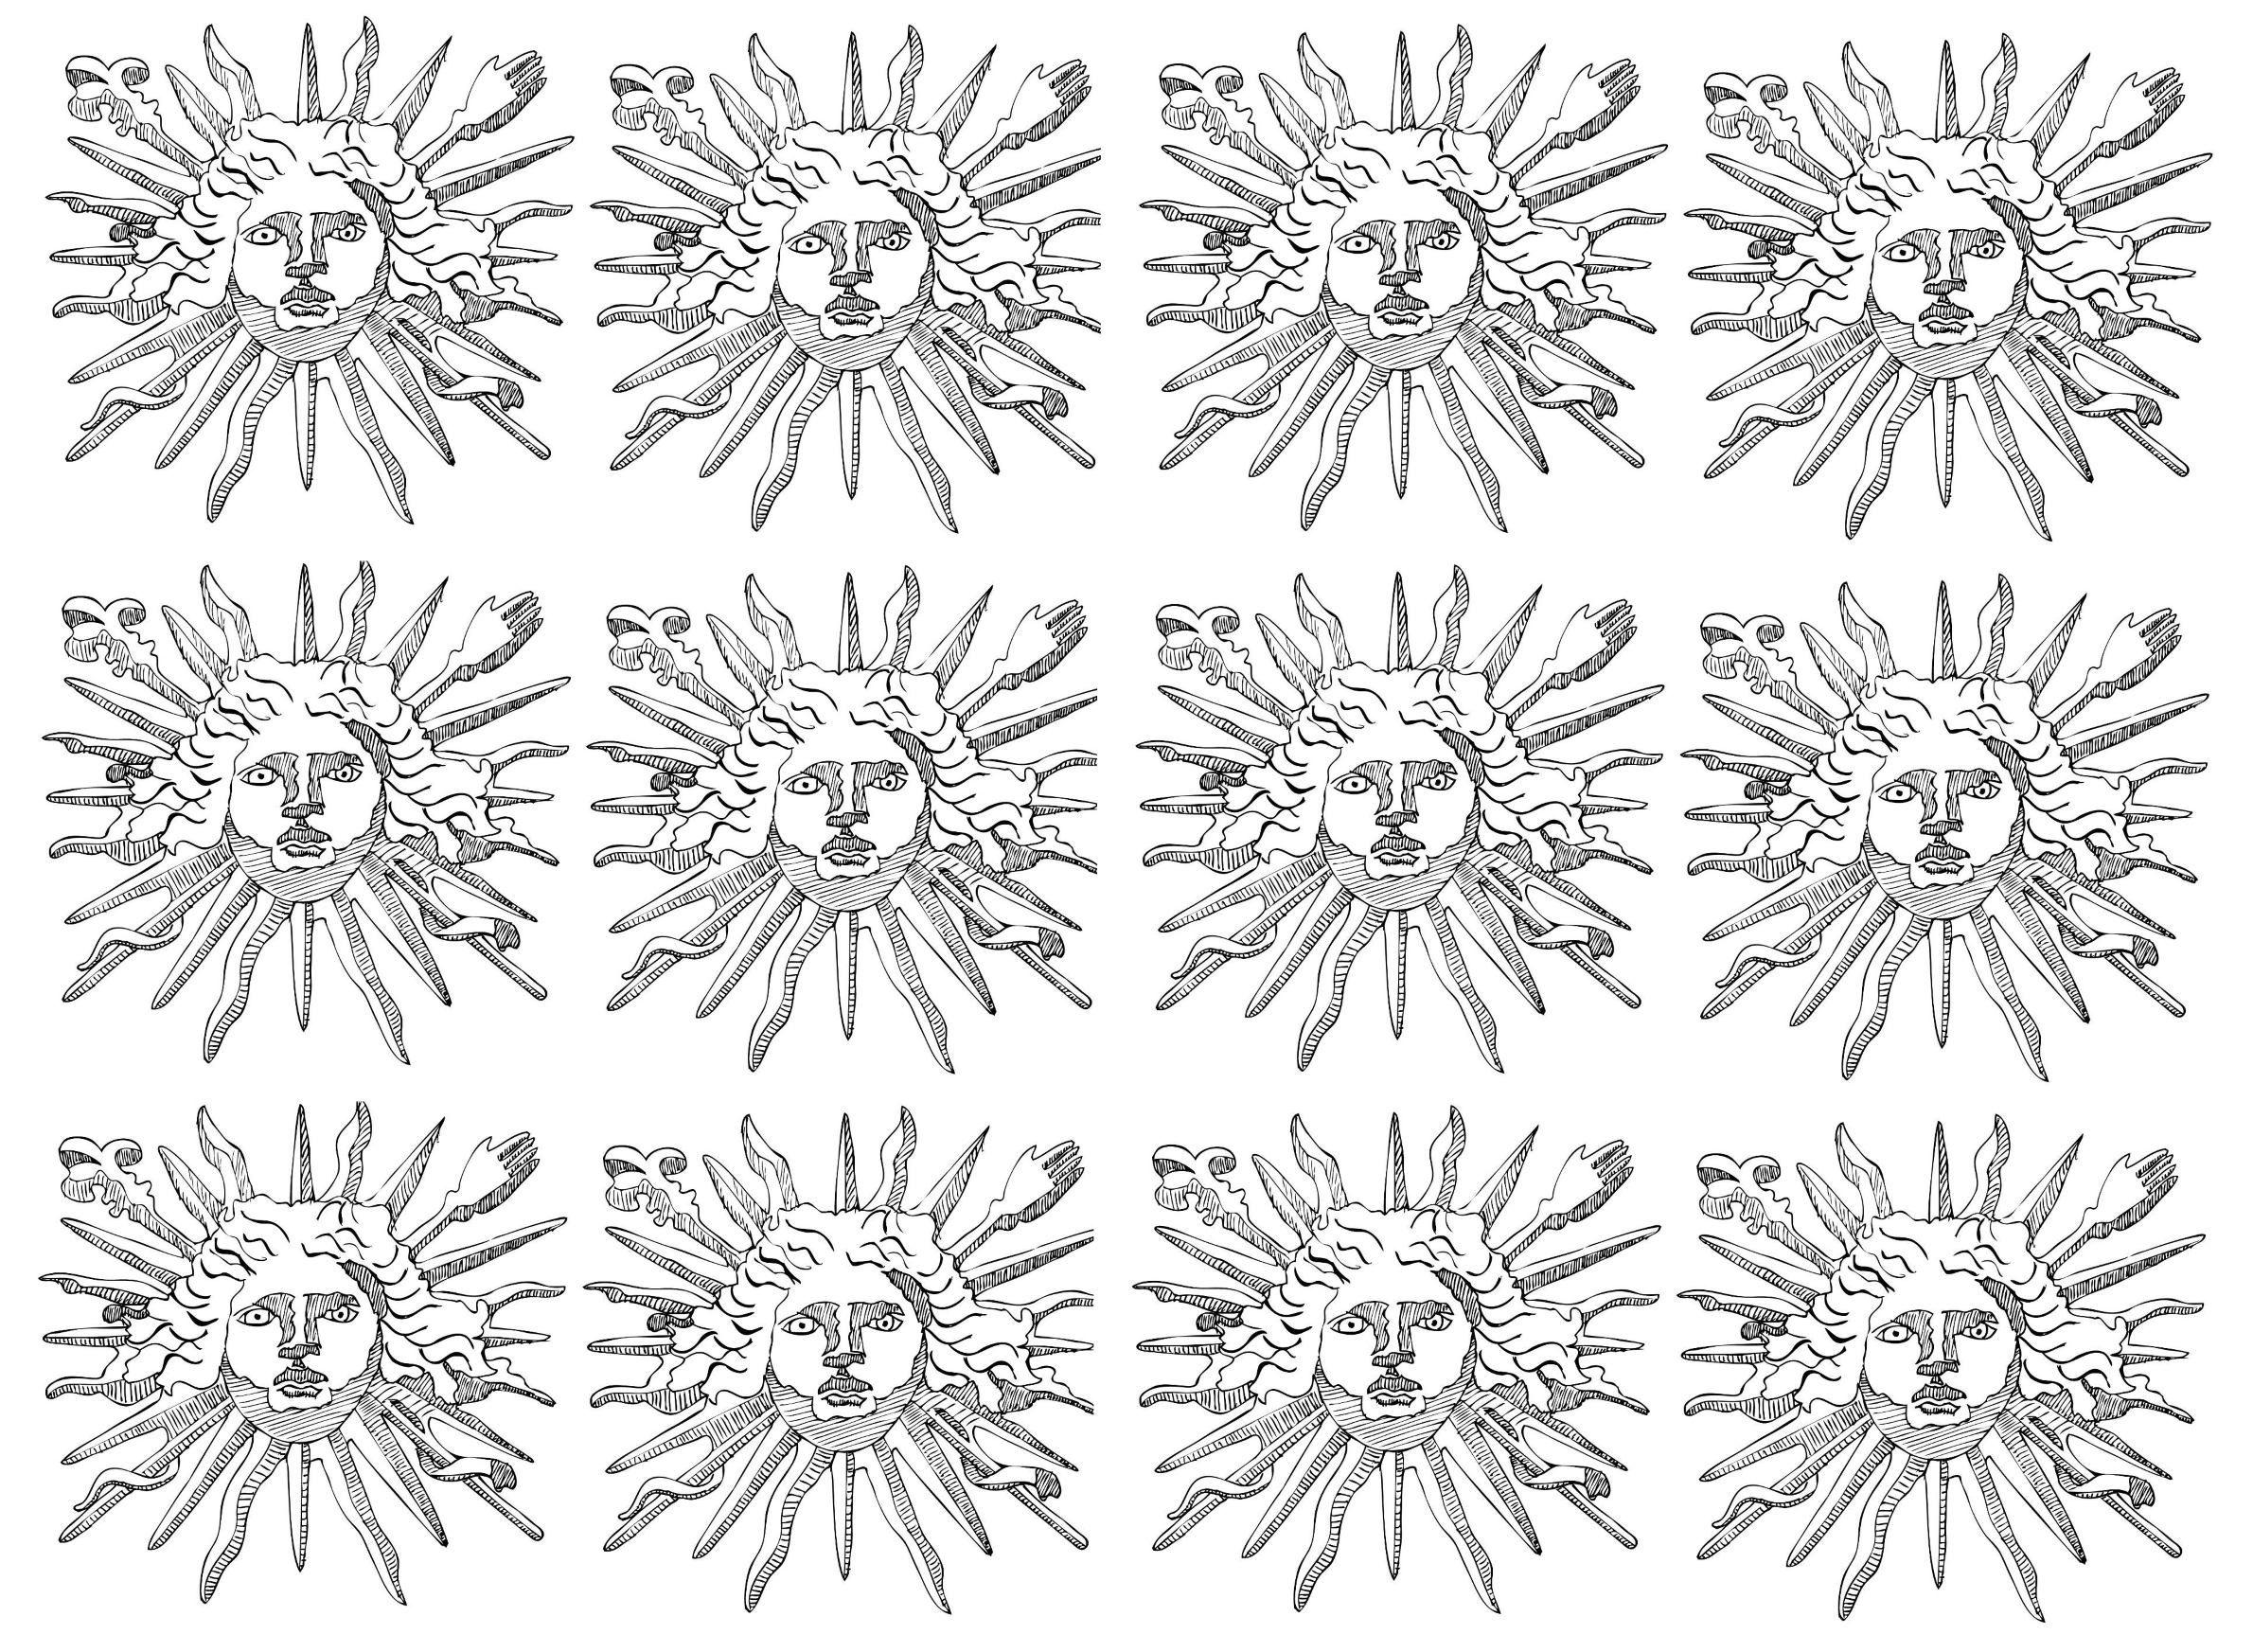 free coloring page coloring symbols louis 14 sun king symbol of